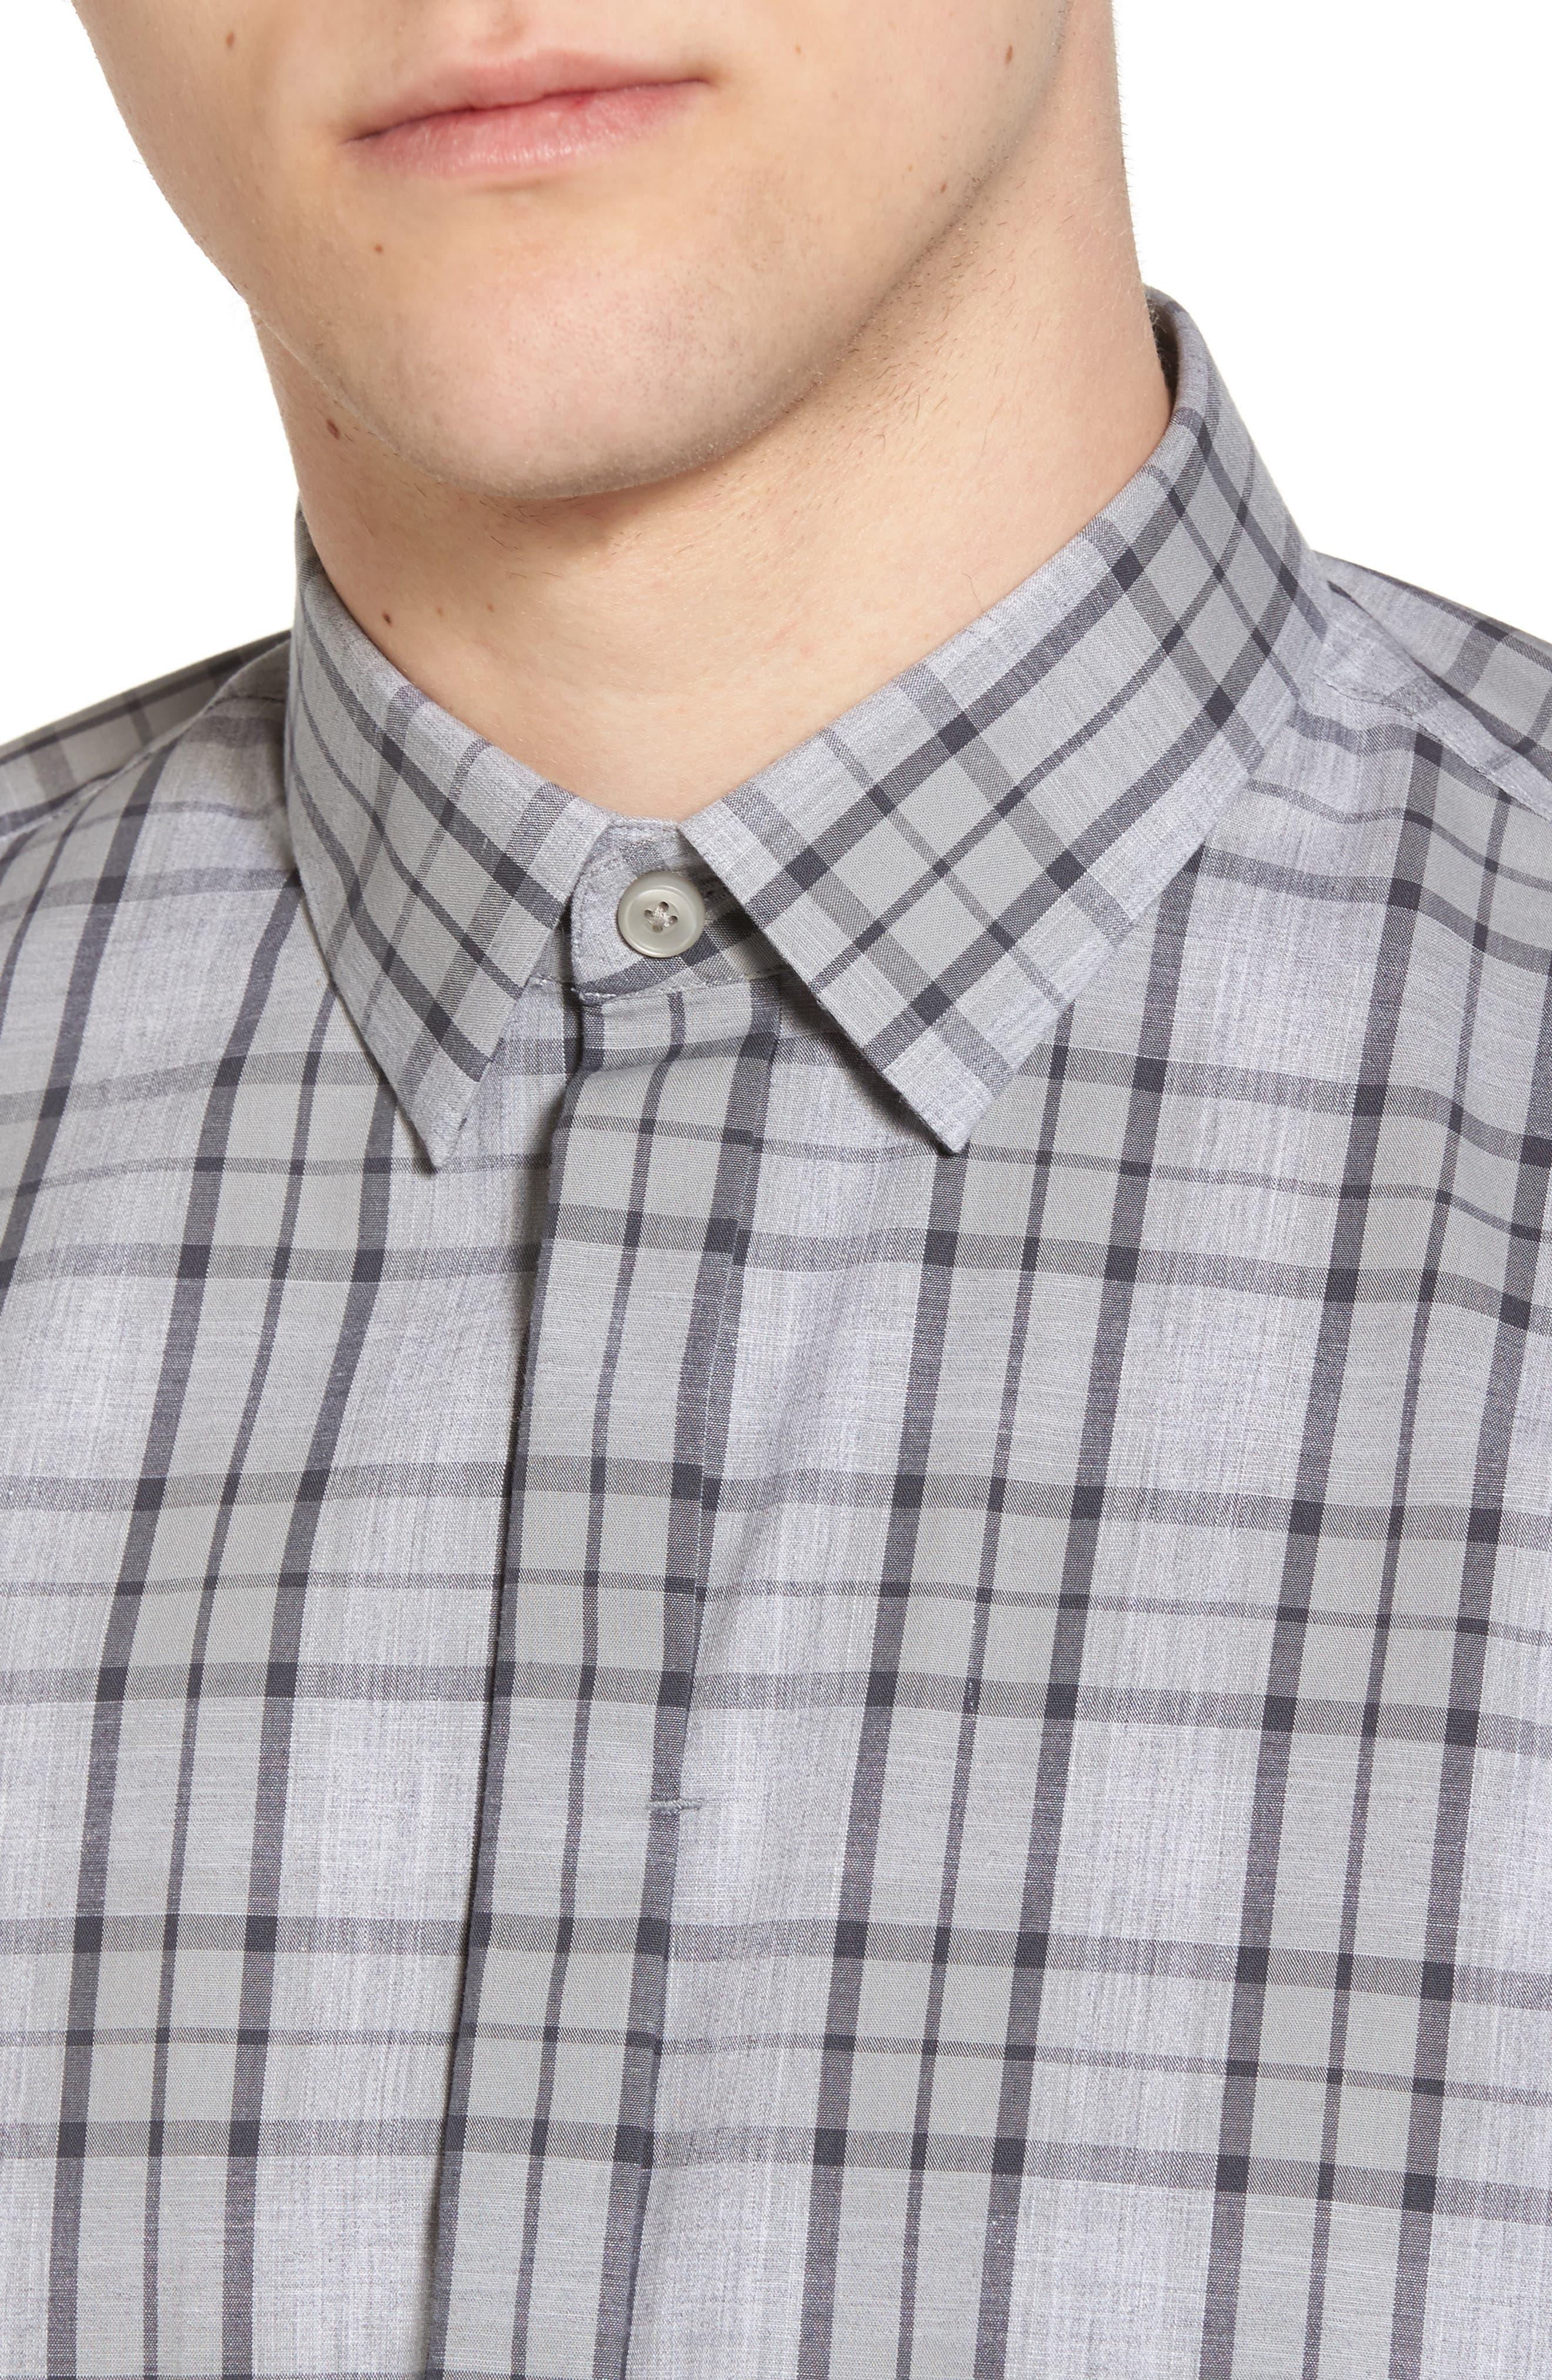 Trim Fit Plaid Sport Shirt,                             Alternate thumbnail 4, color,                             Grey Micro Heather Plaid